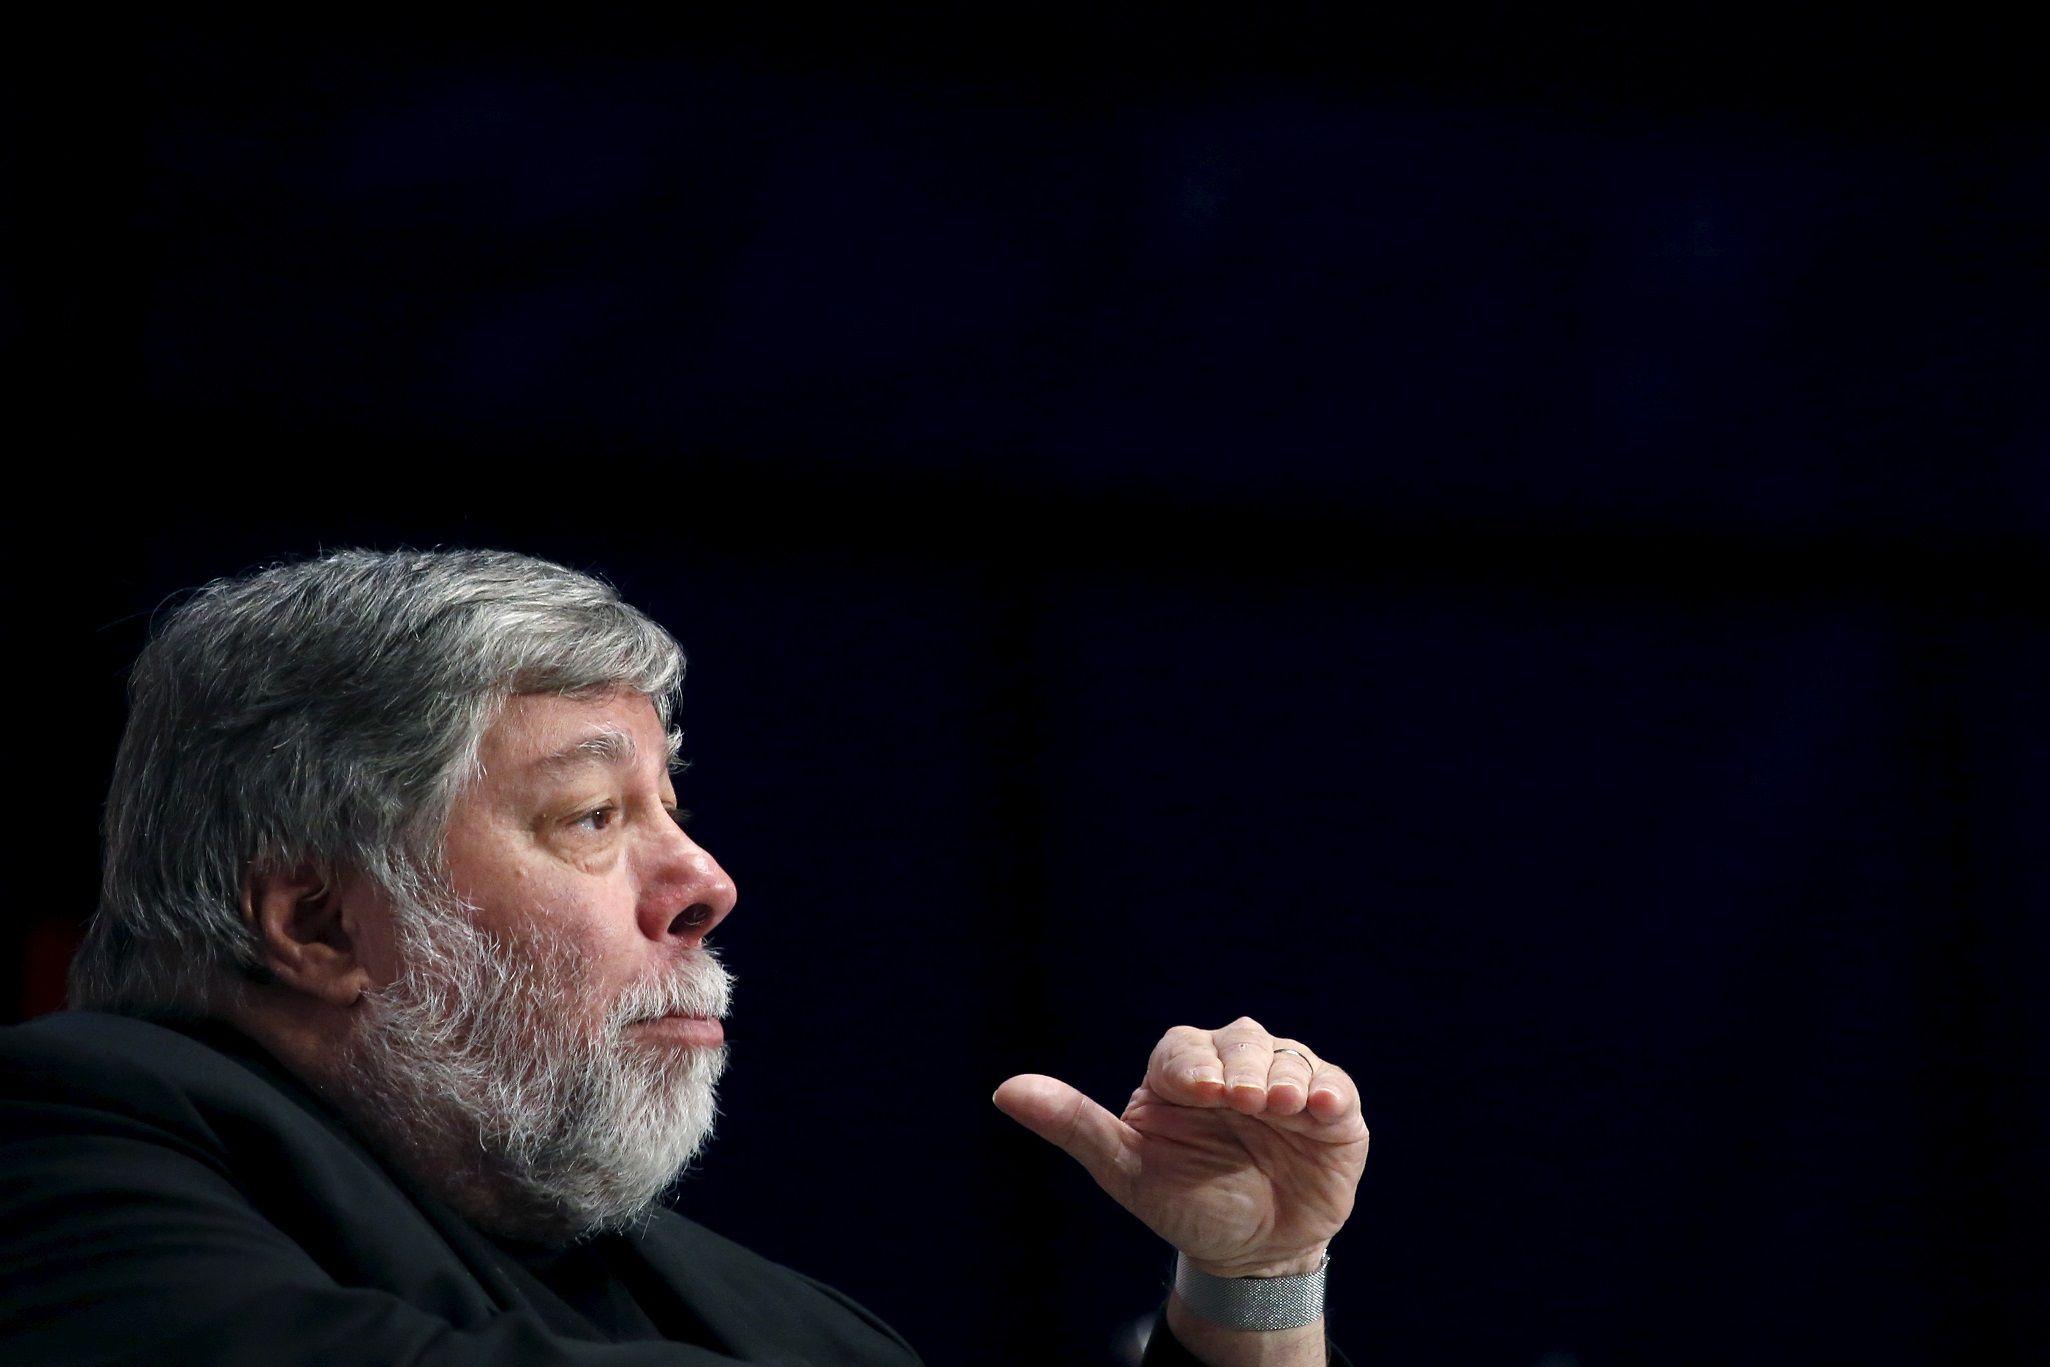 Apple CoFounder Steve Wozniak Says Tech Giant Should Pay